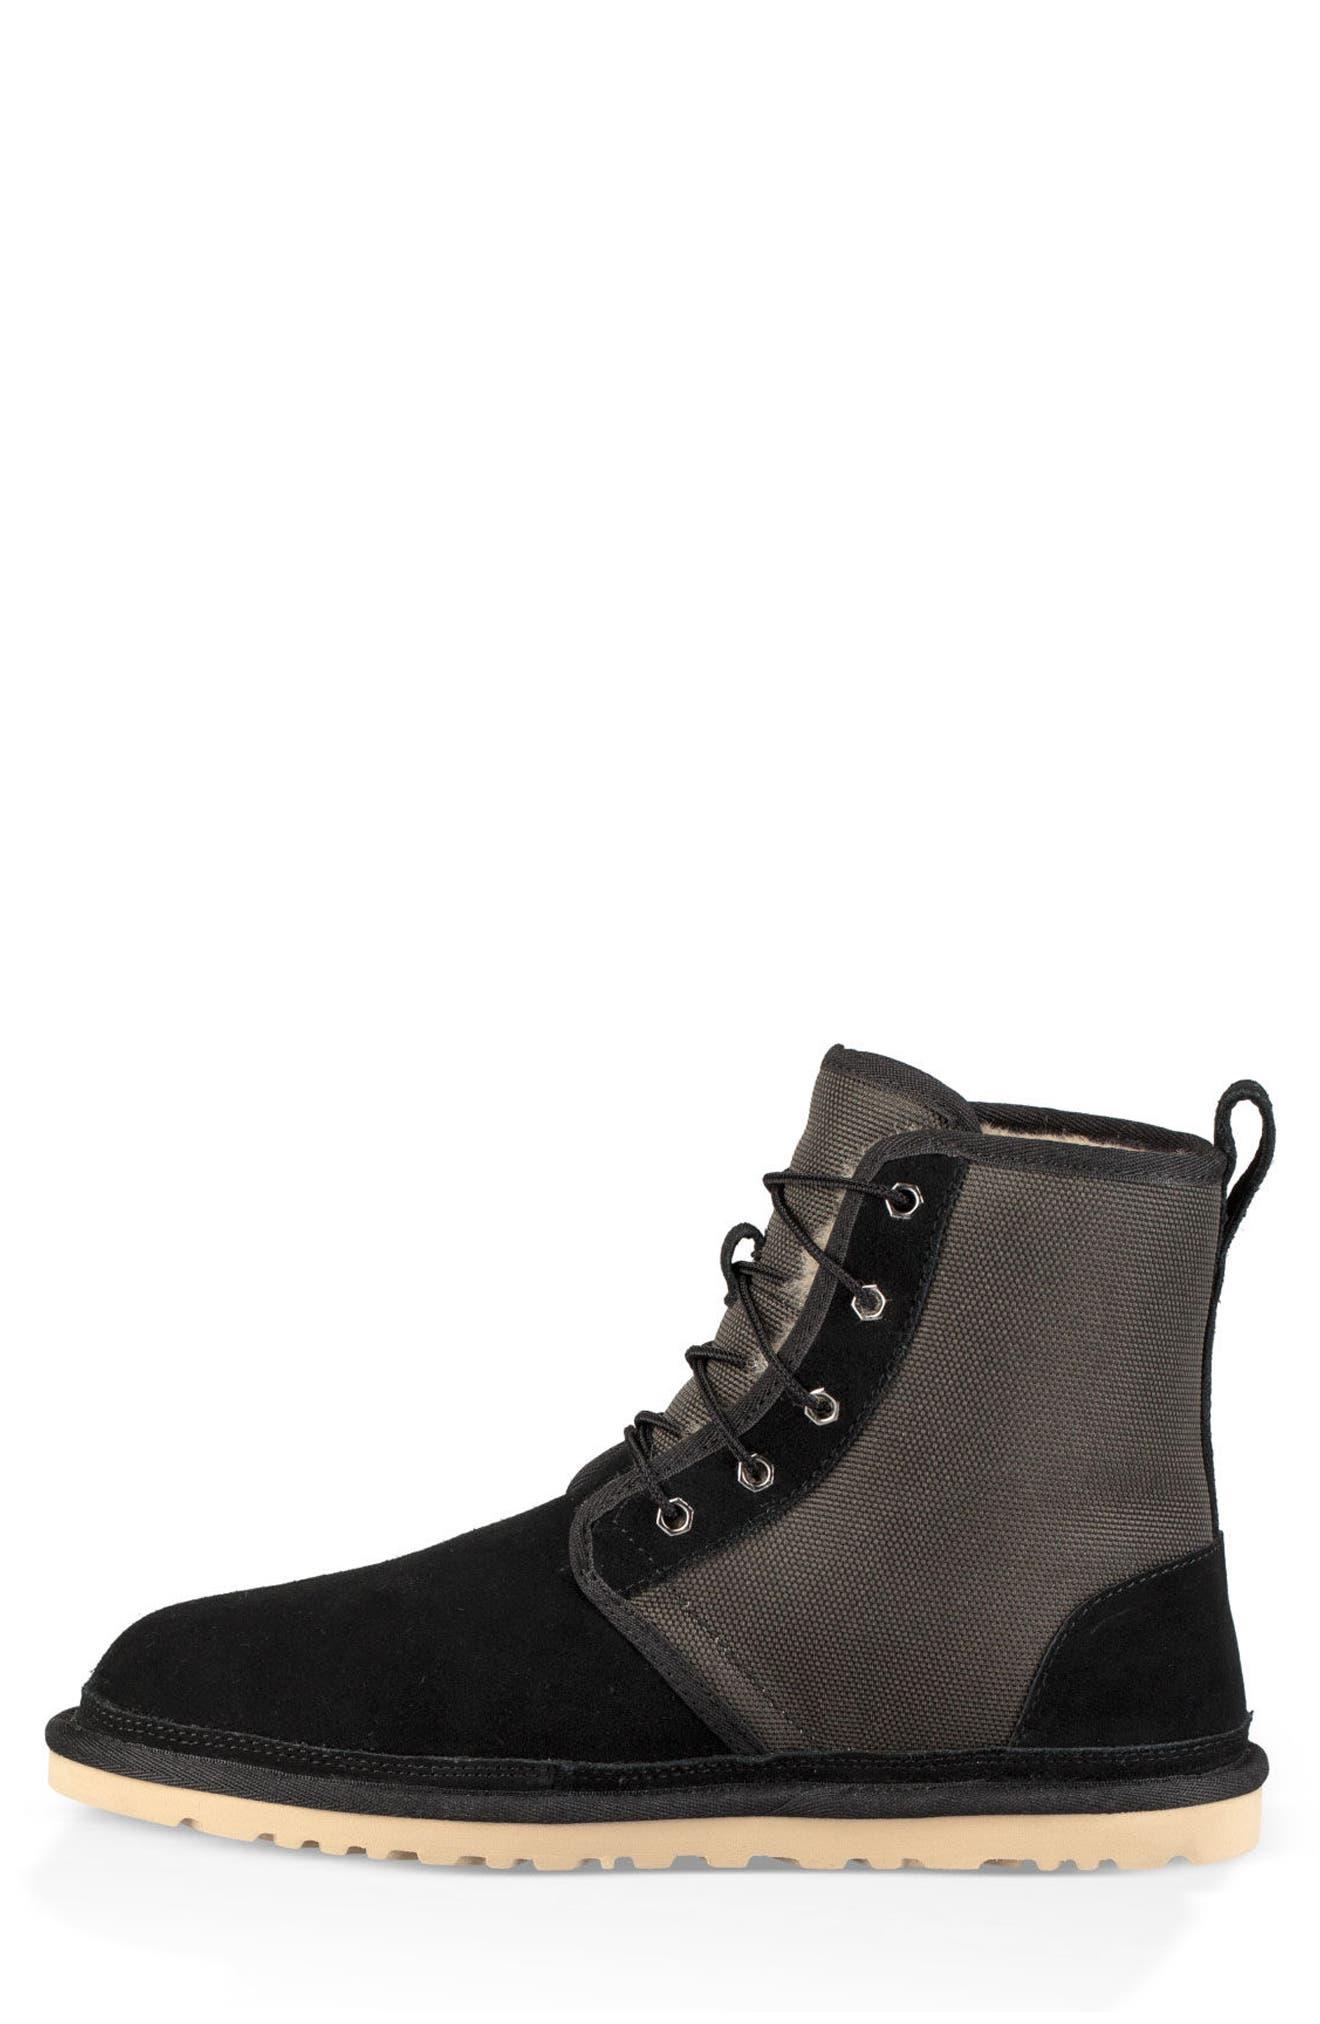 Harkley Lace-Up Boot,                             Alternate thumbnail 3, color,                             BLACK SUEDE